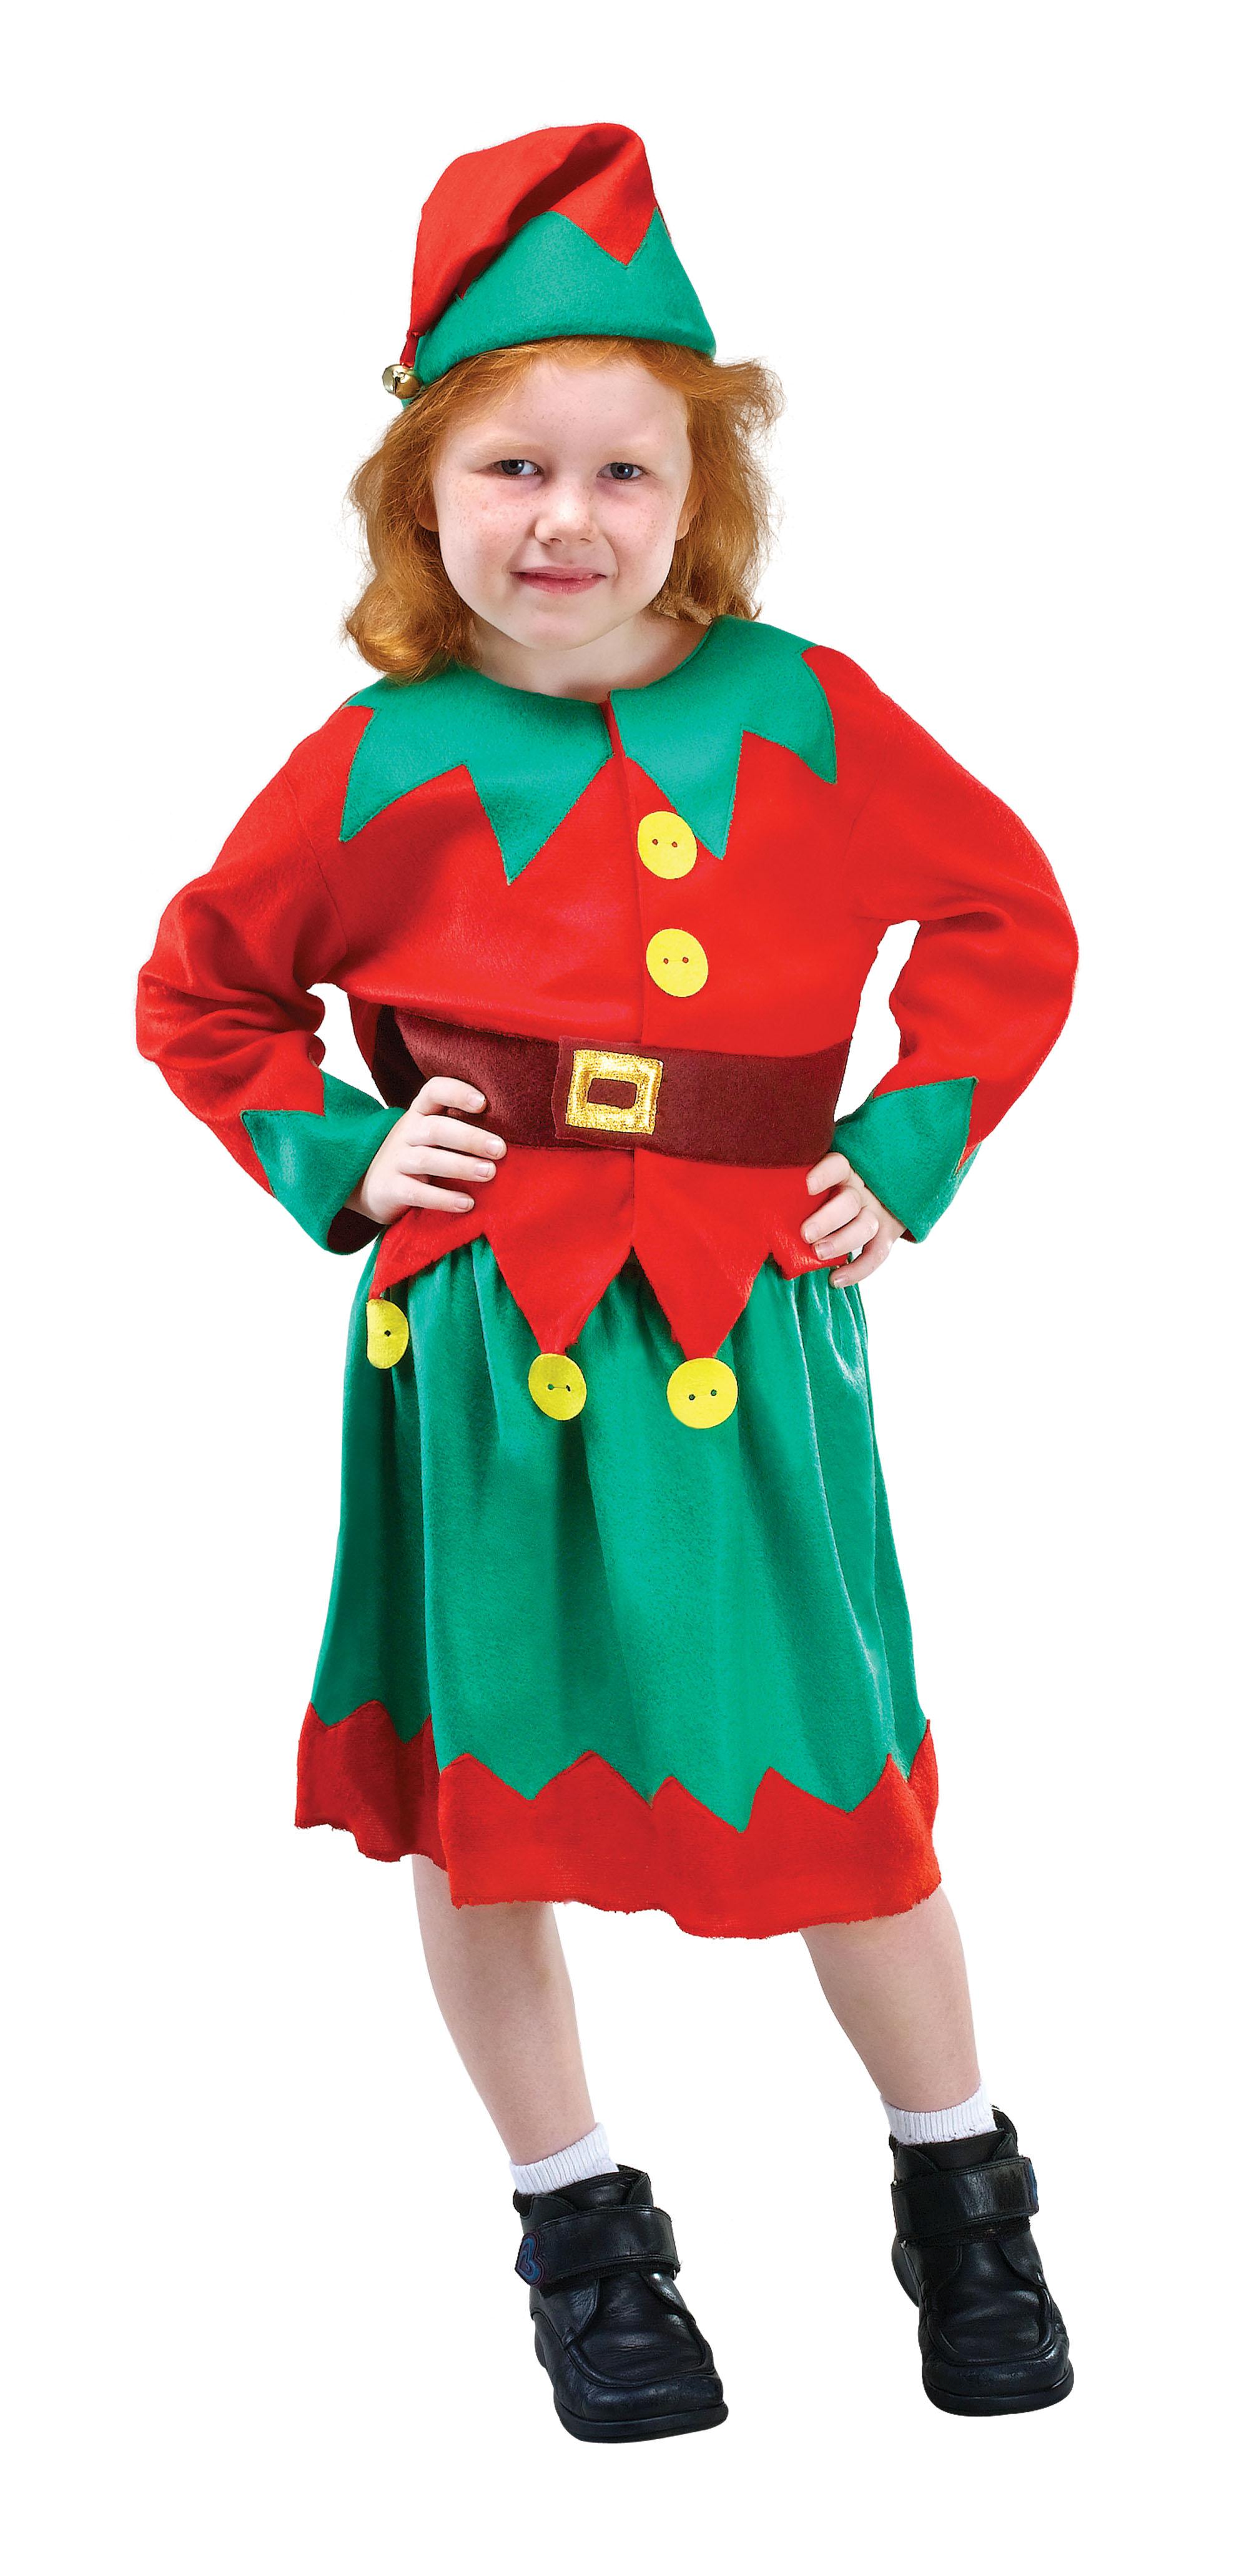 Childs Santa's Helper, Elf Costume.